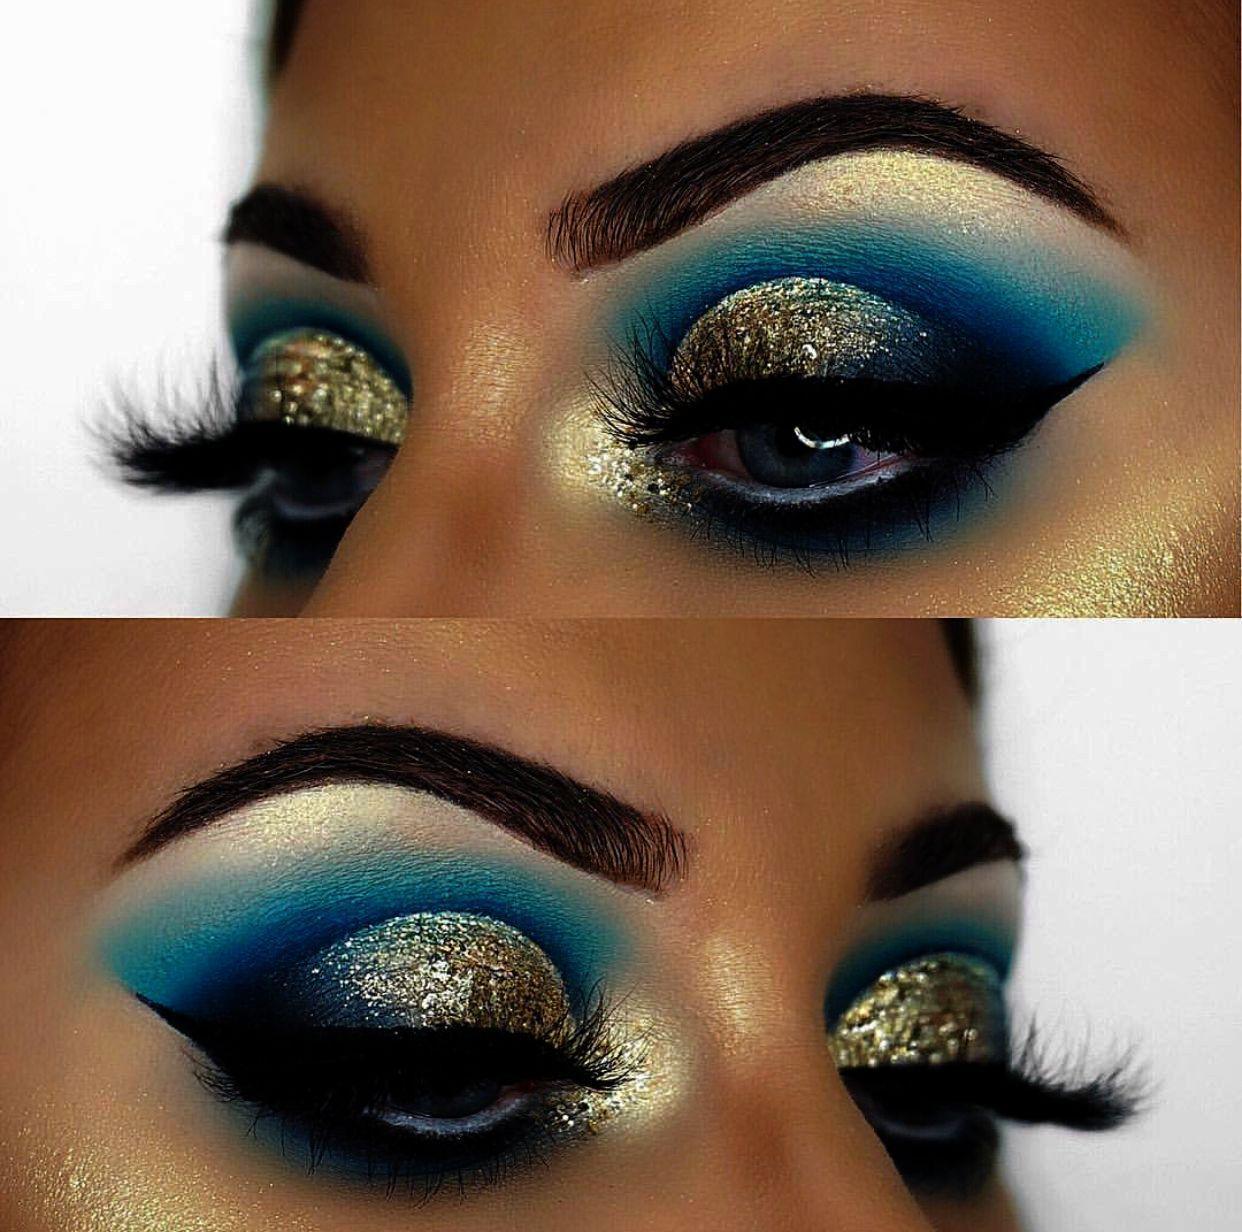 Rhinestone Eye Makeup Ideas; Eye Makeup For Older Women's